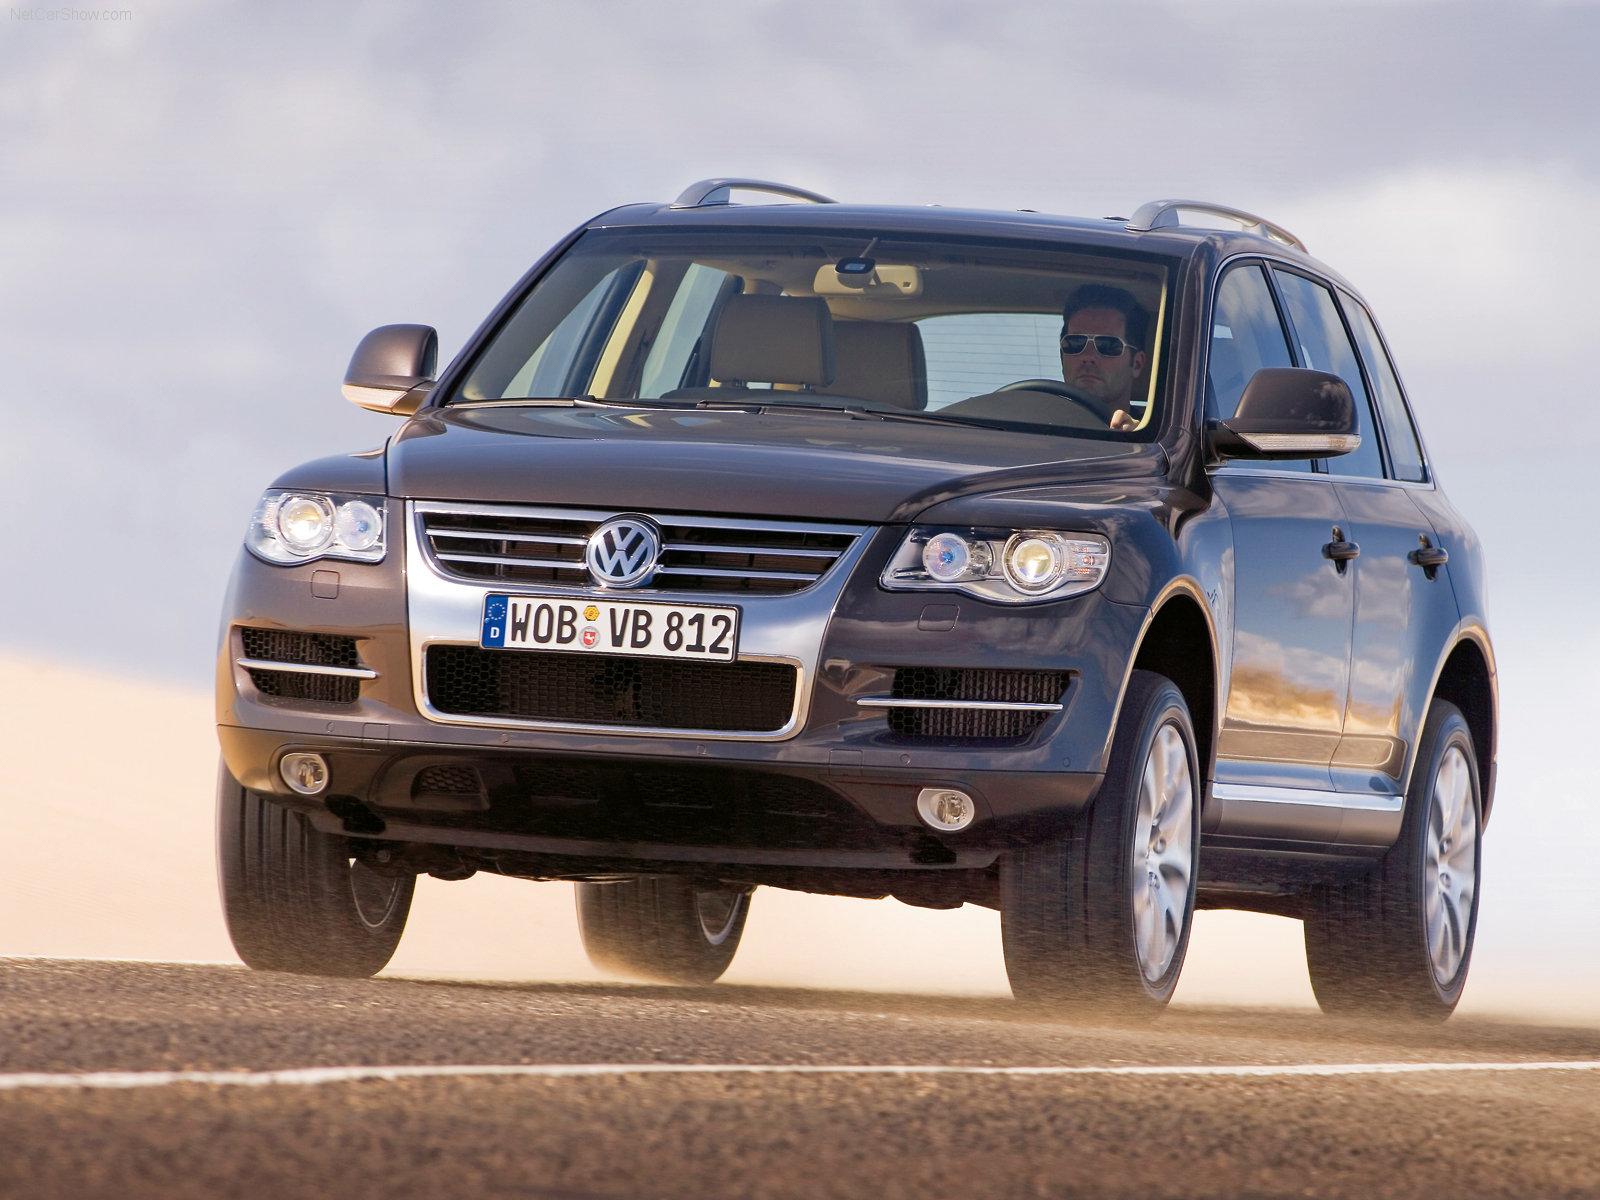 https://w04.ru/foto/Volkswagen-Touareg_2007_1600x1200_wallpaper_01.jpg